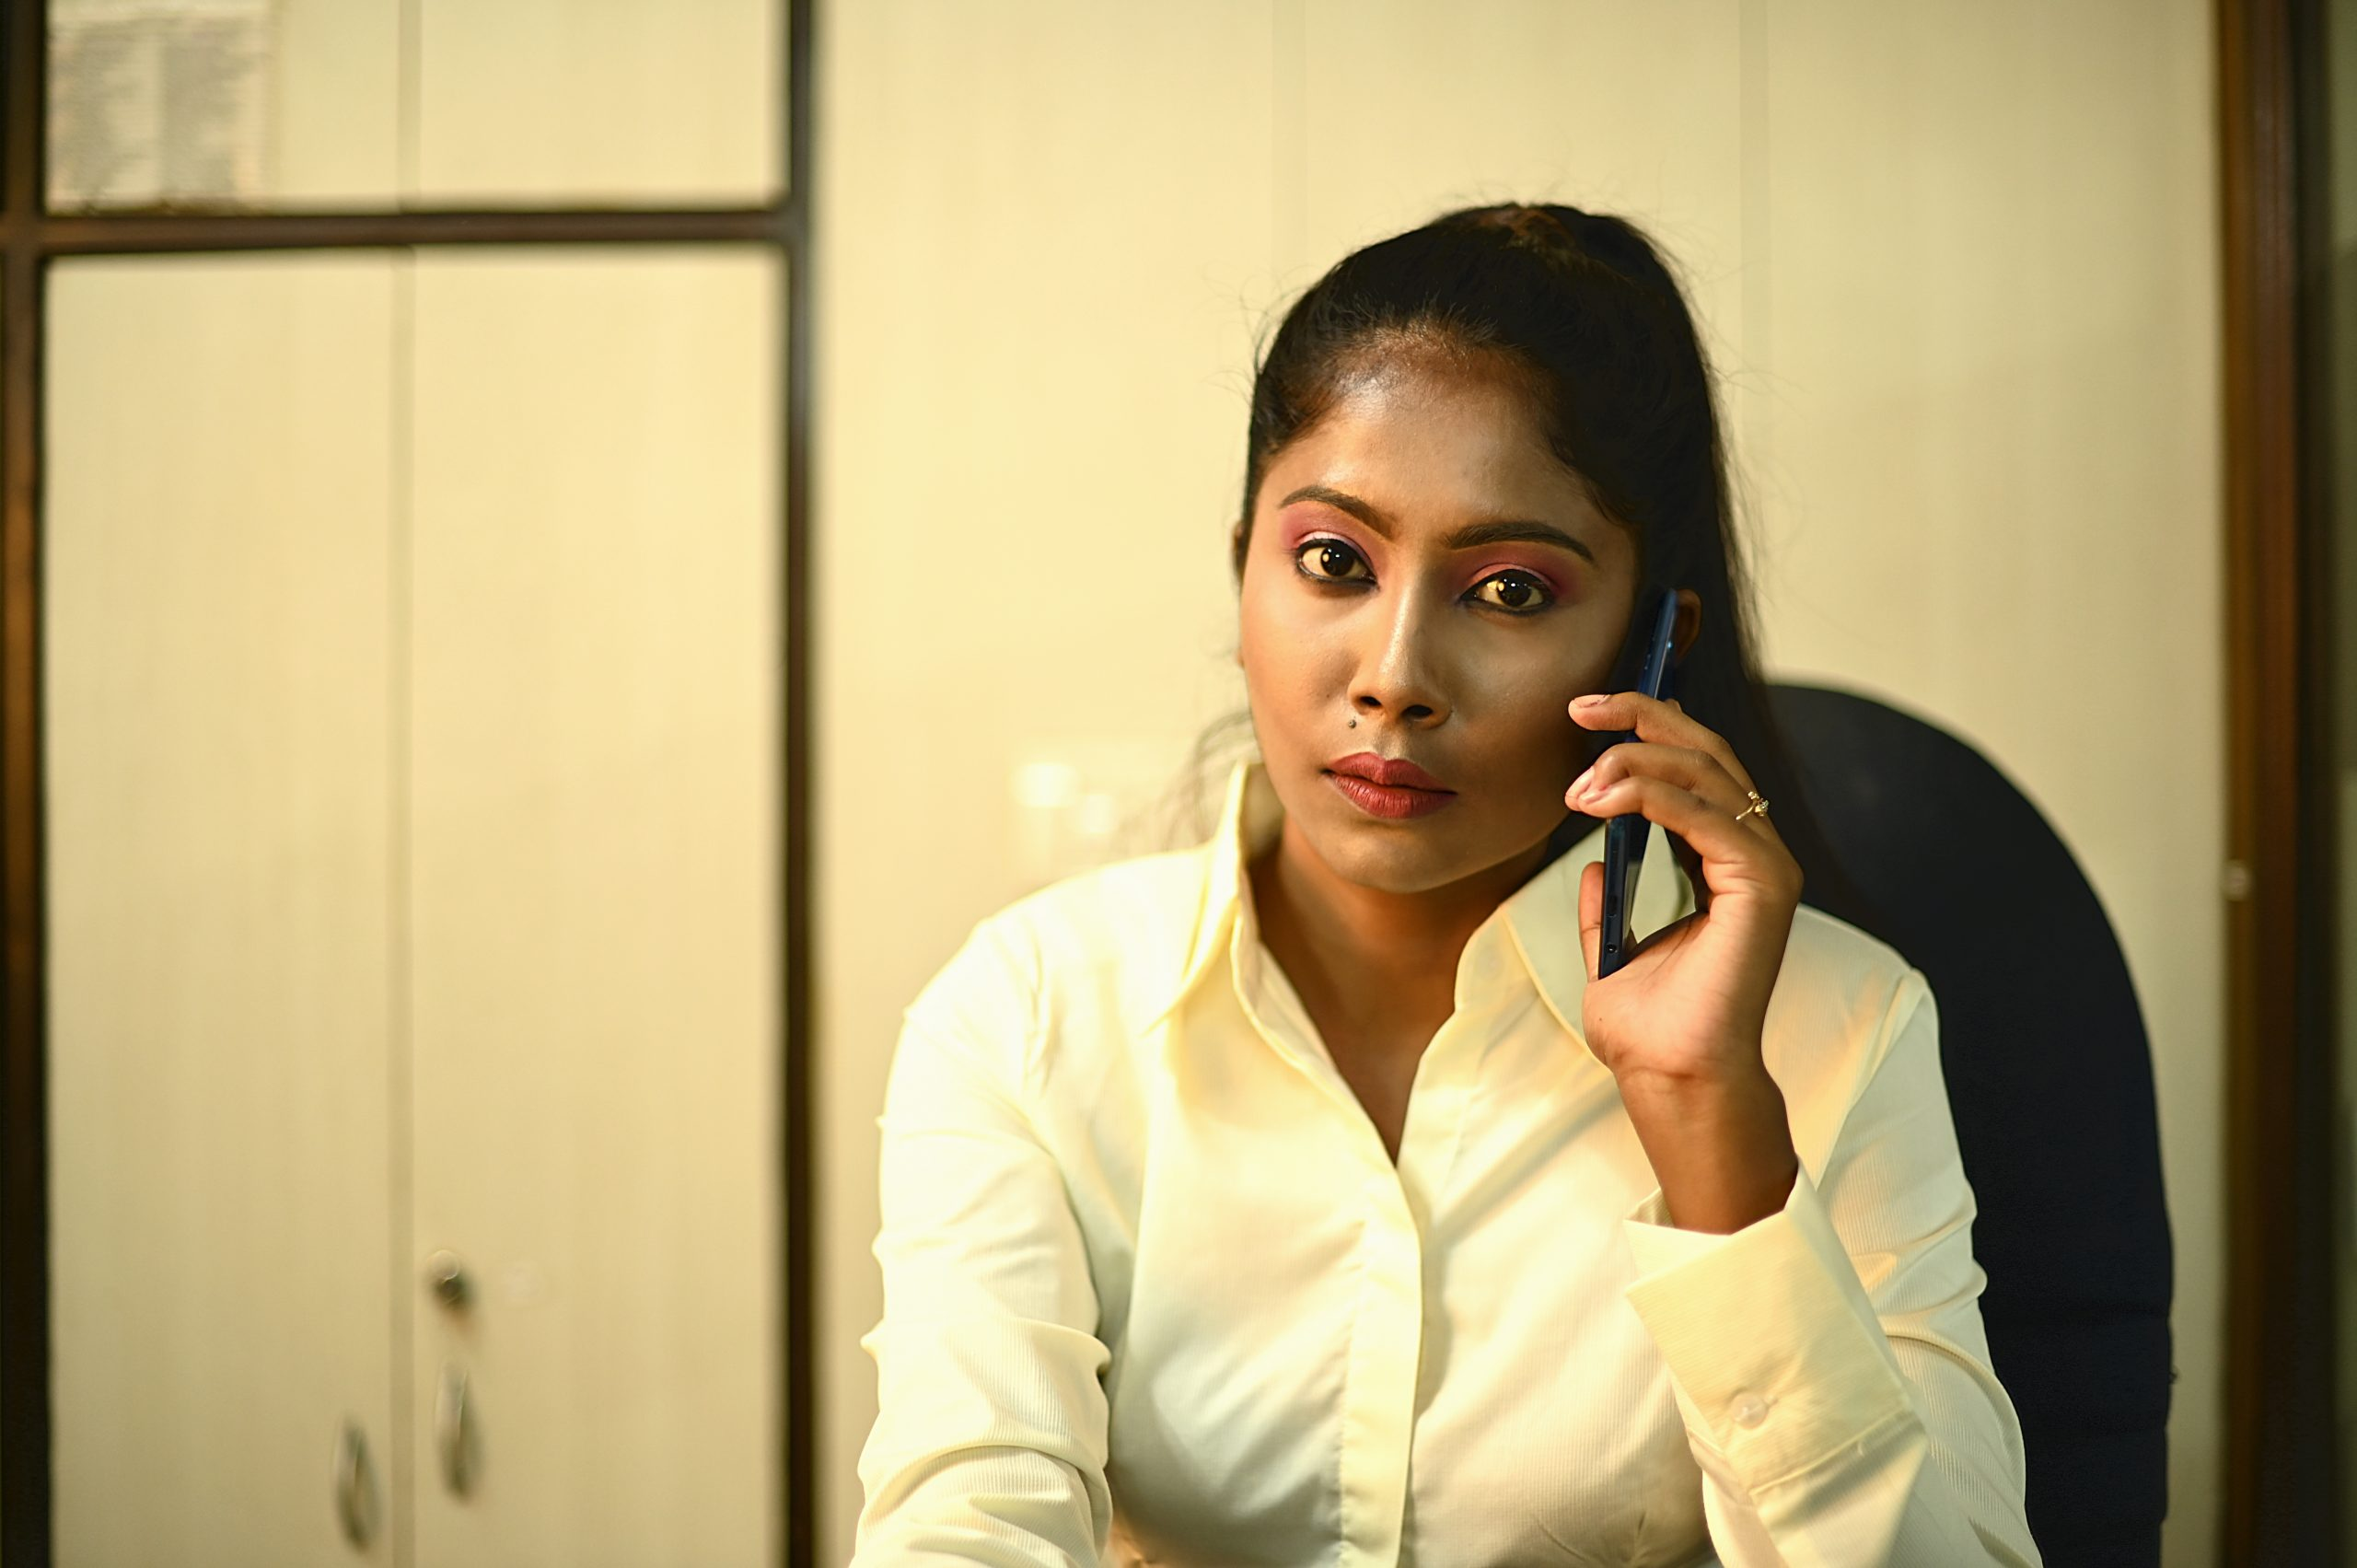 The Corporate Call Operator